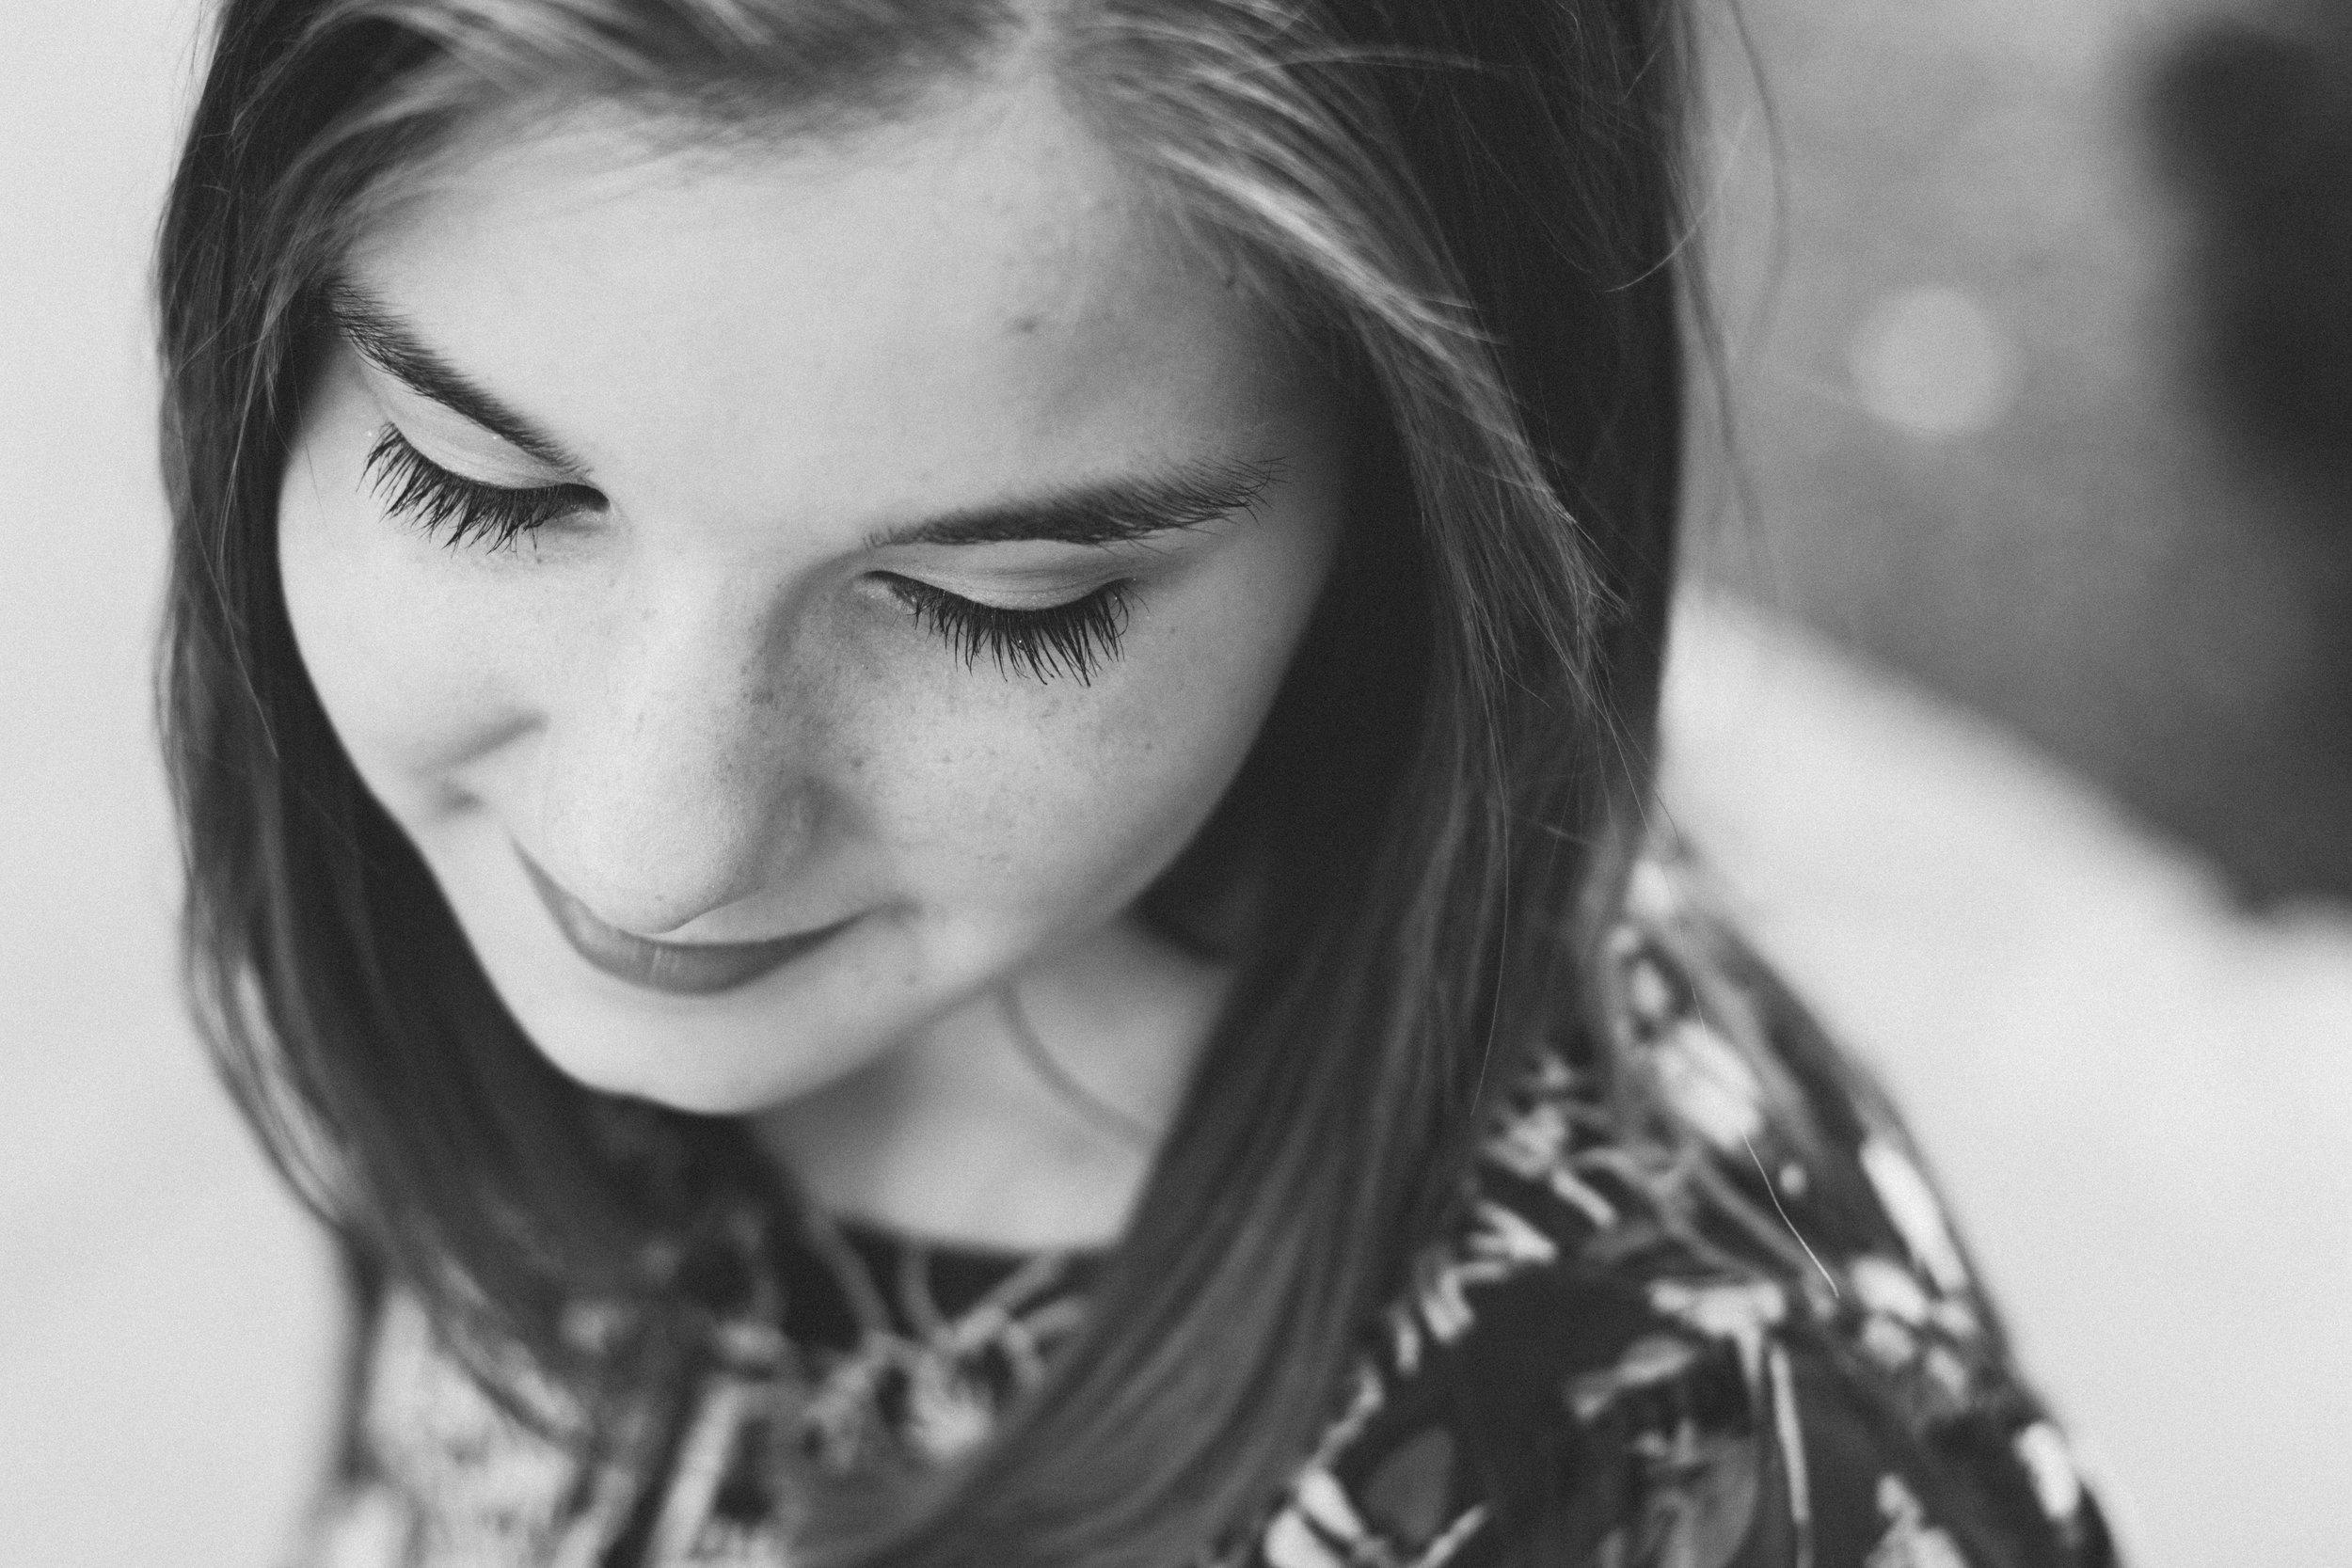 saundra_megan_portrait_aubrie_barker.jpg